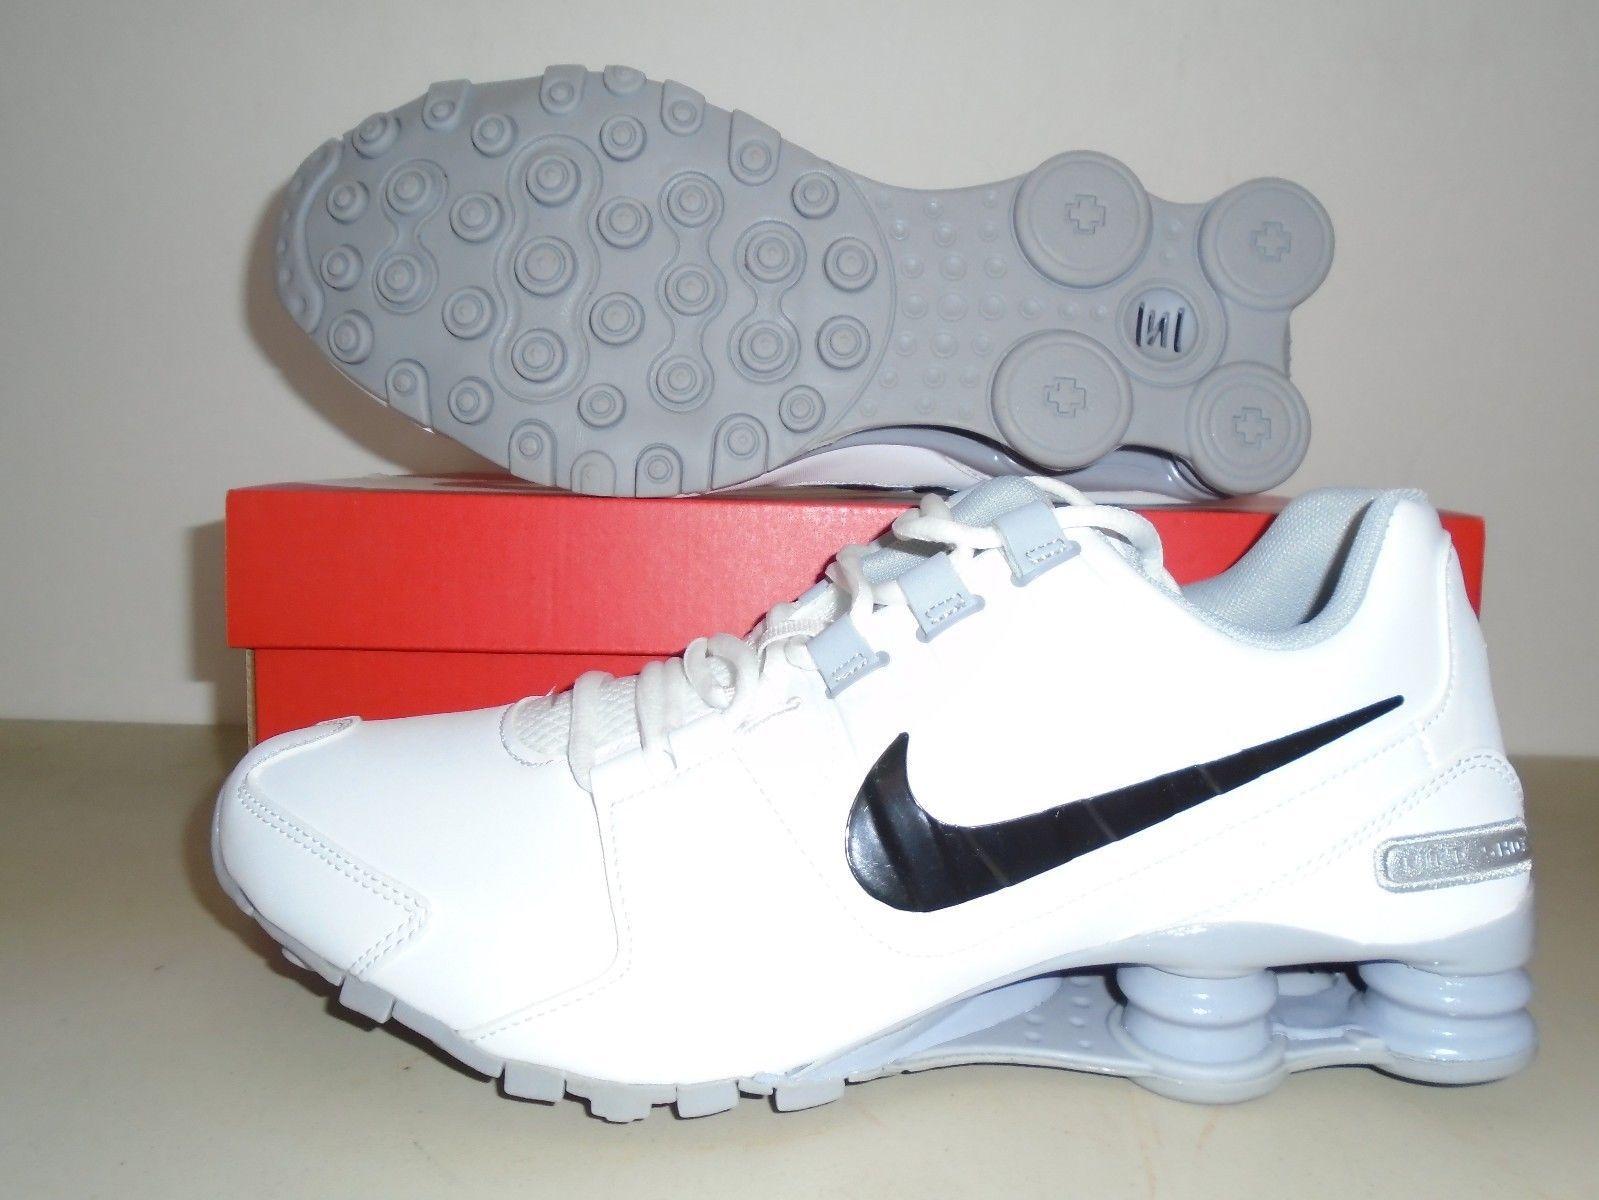 #Men #Shoes New Nike Shox Avenue Leather White Black Grey Running Shoes sz  13